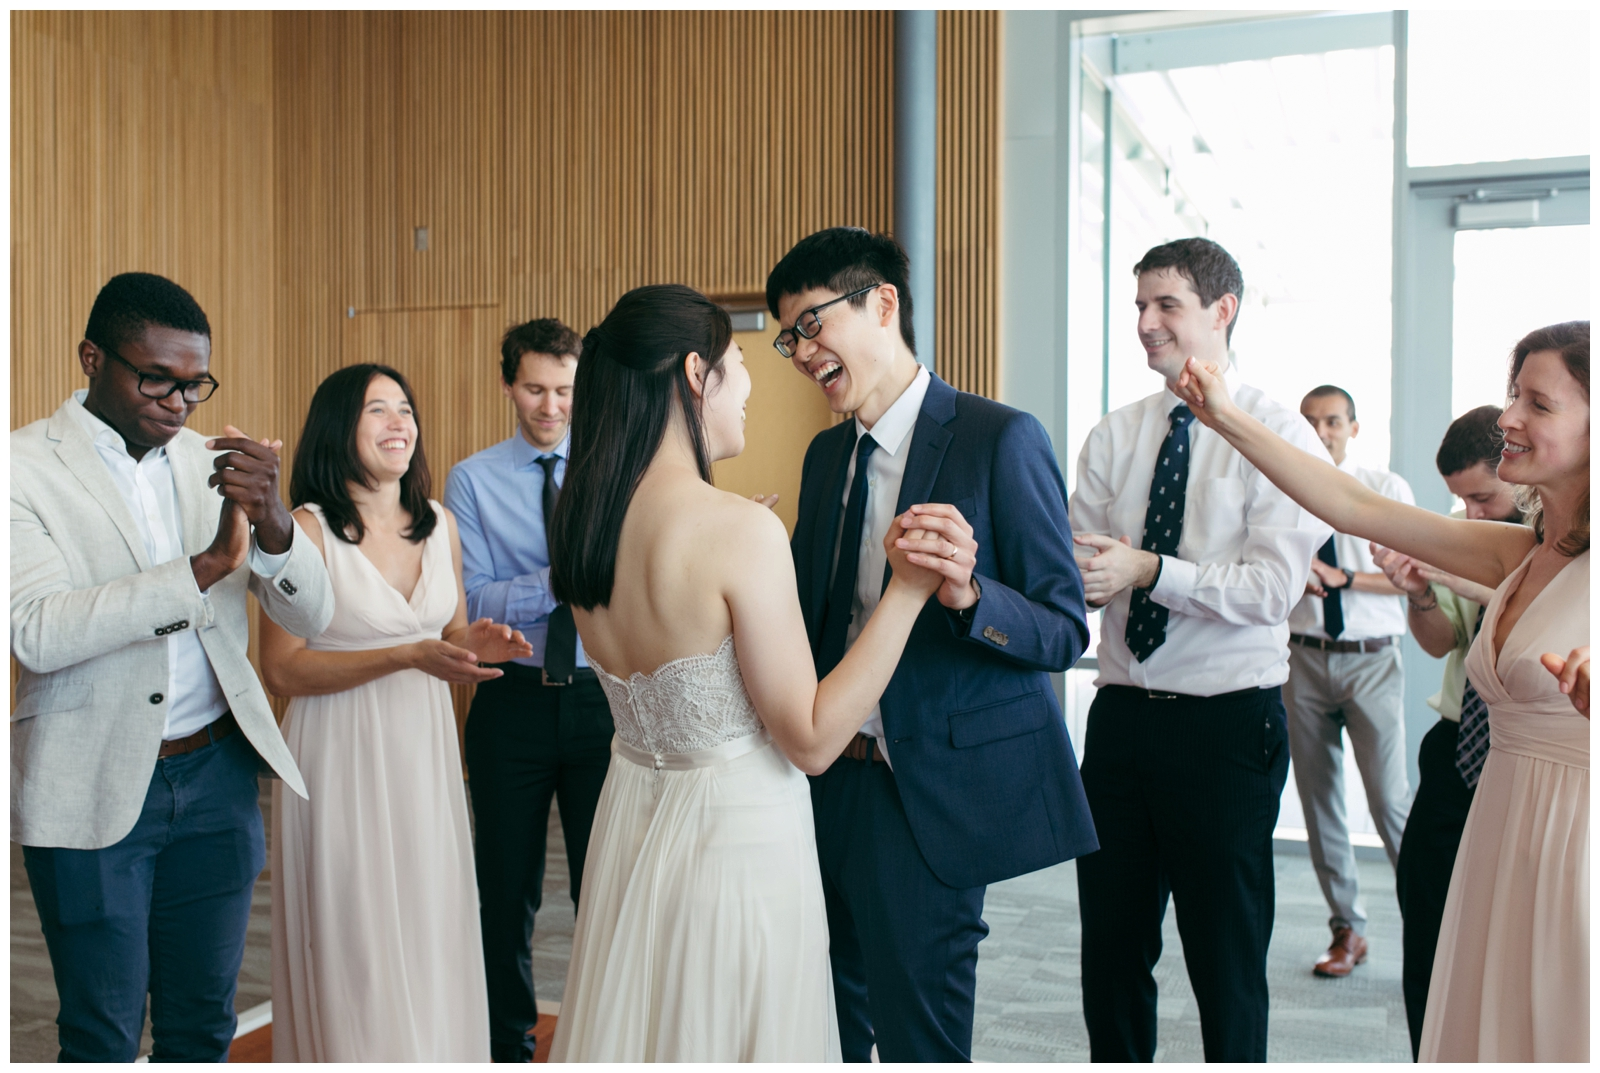 Samberg-Conference-Center-Boston-Wedding-Photographer-Bailey-Q-Photo-134.jpg